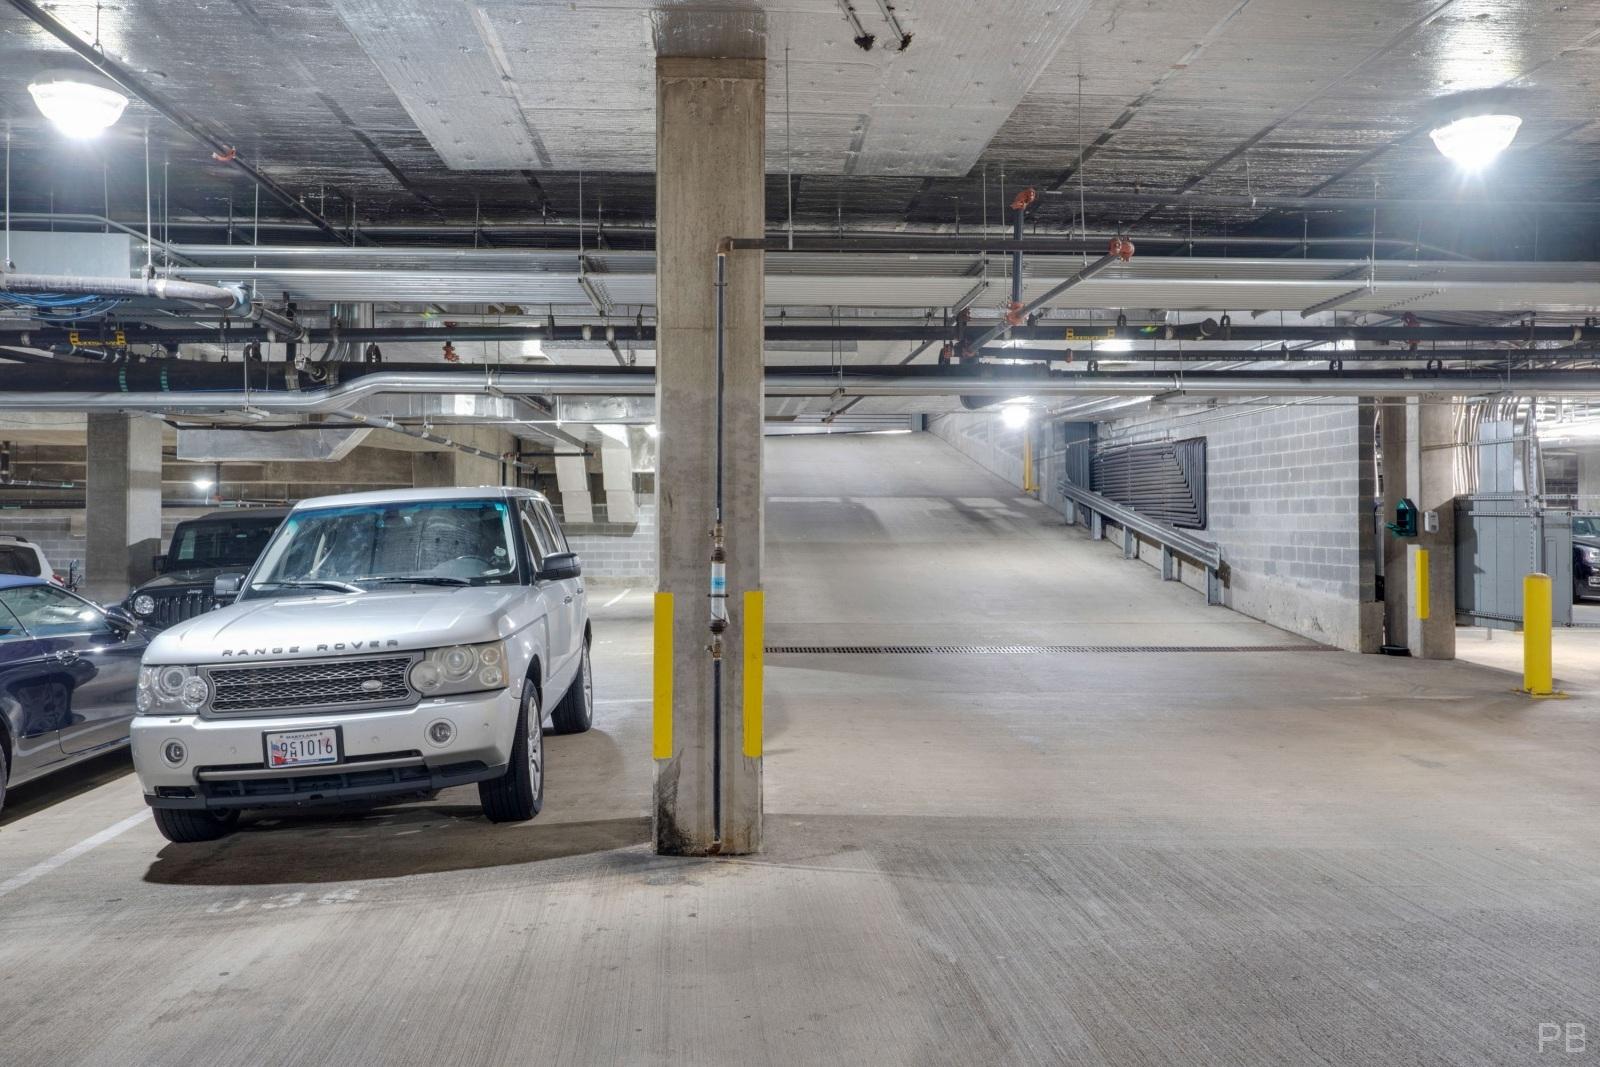 Garage parking space #38 next to the garage entrance